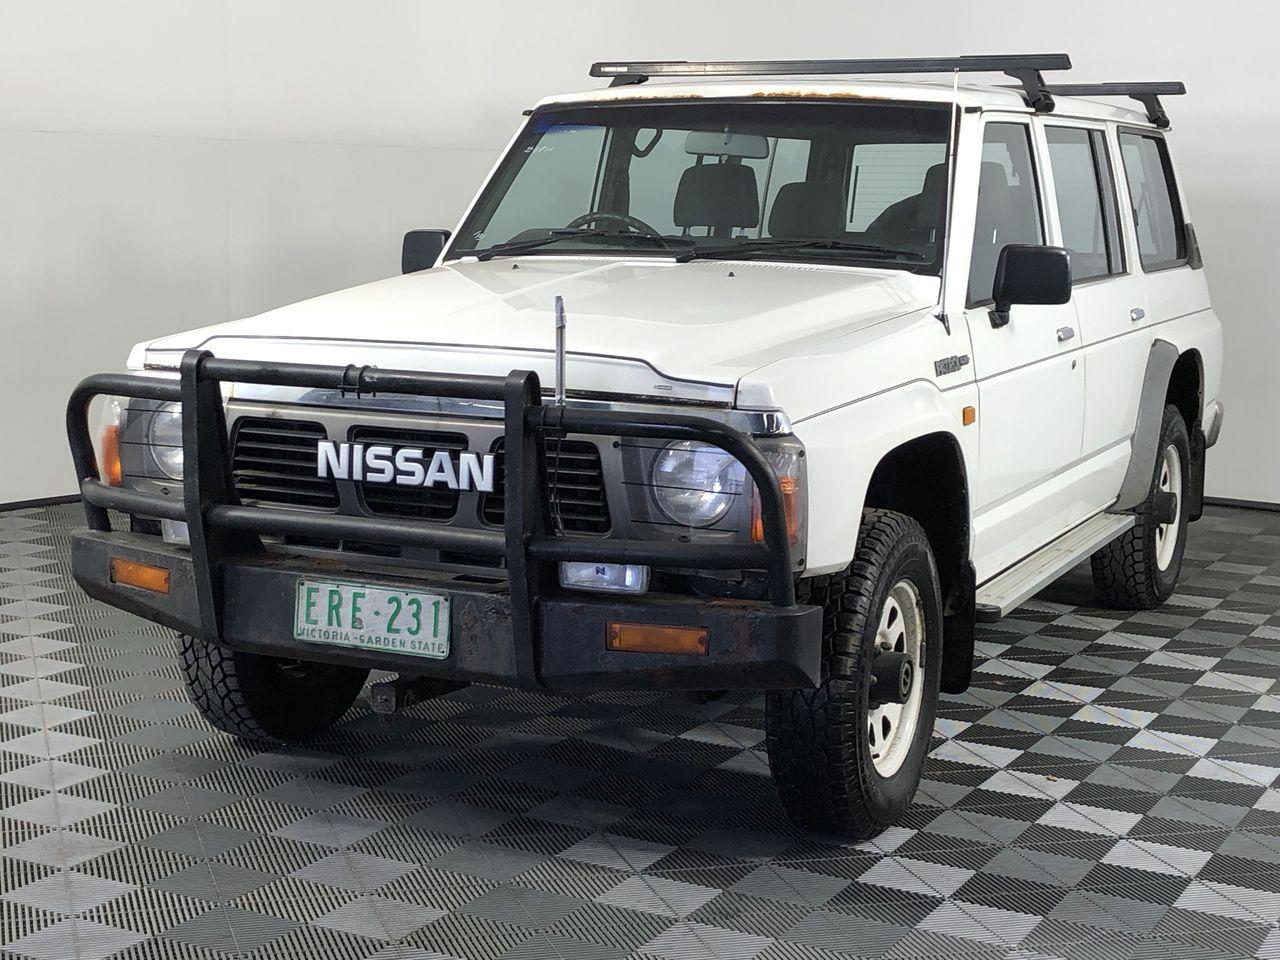 1991 Nissan Patrol GQ Manual 7 Seats Wagon